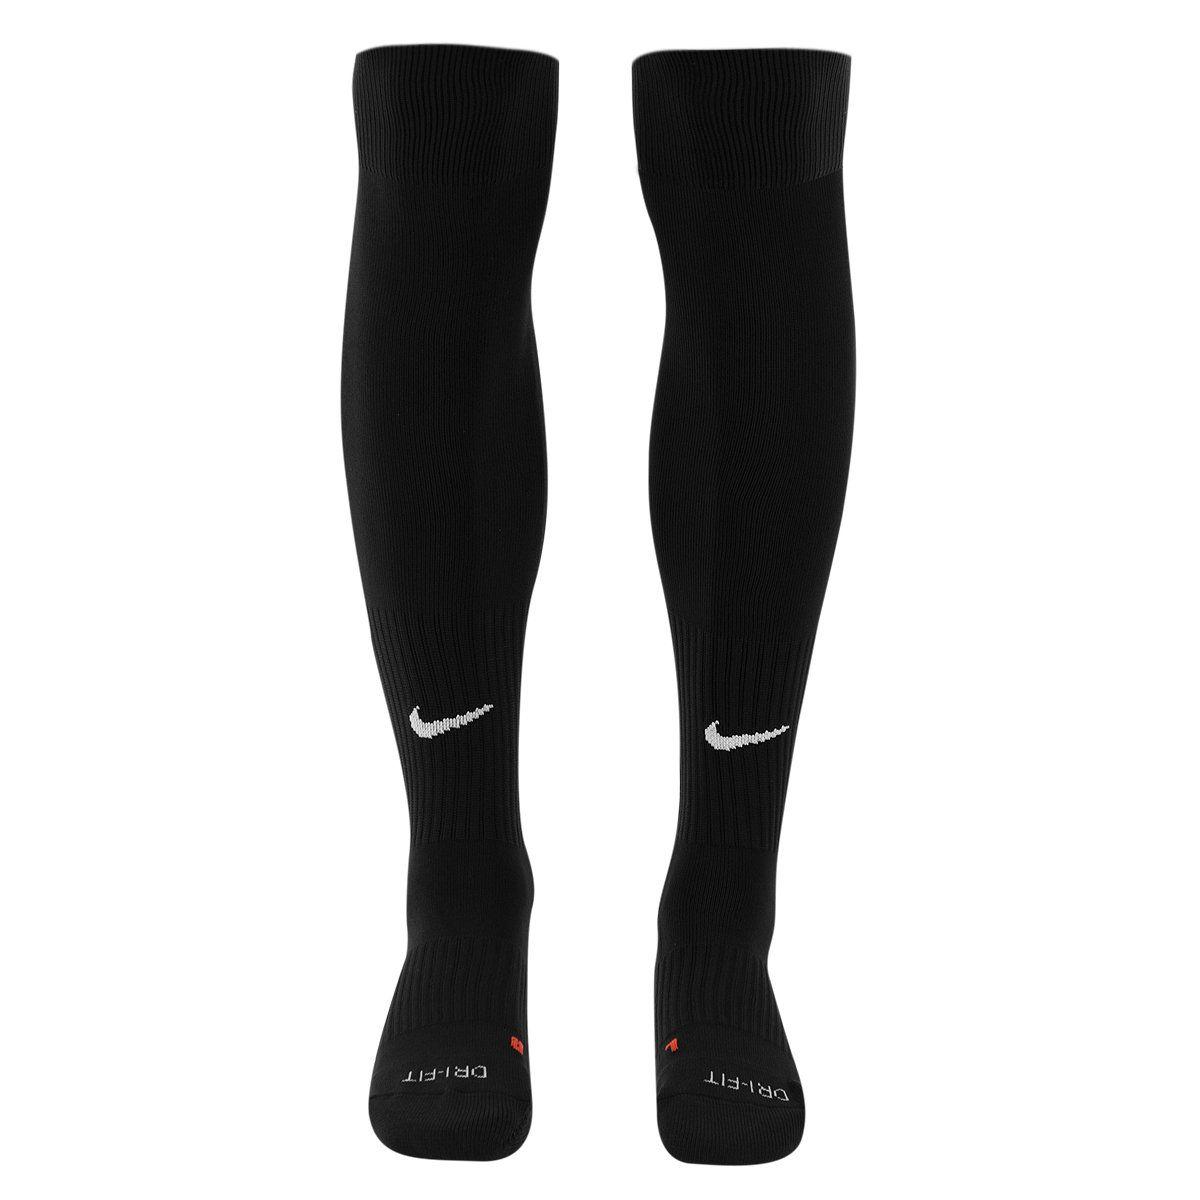 Meião Nike Classic Football Dri-Fit Preto  - REAL ESPORTE